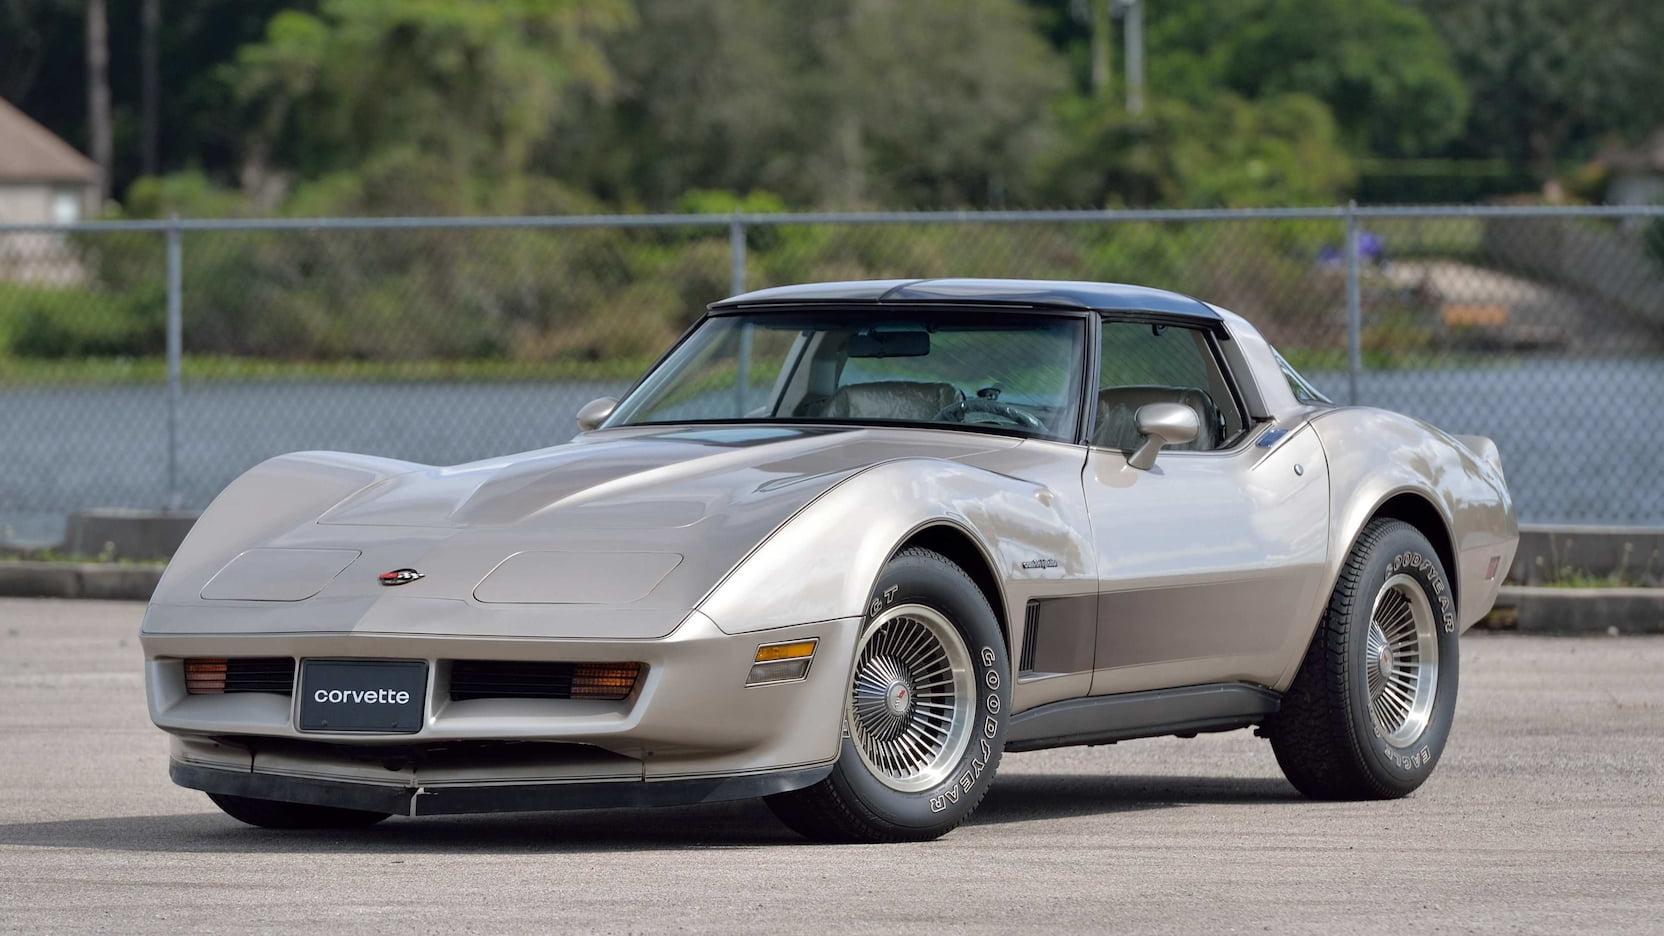 1982 Corvette Collectors Edition Front Three-Quarter